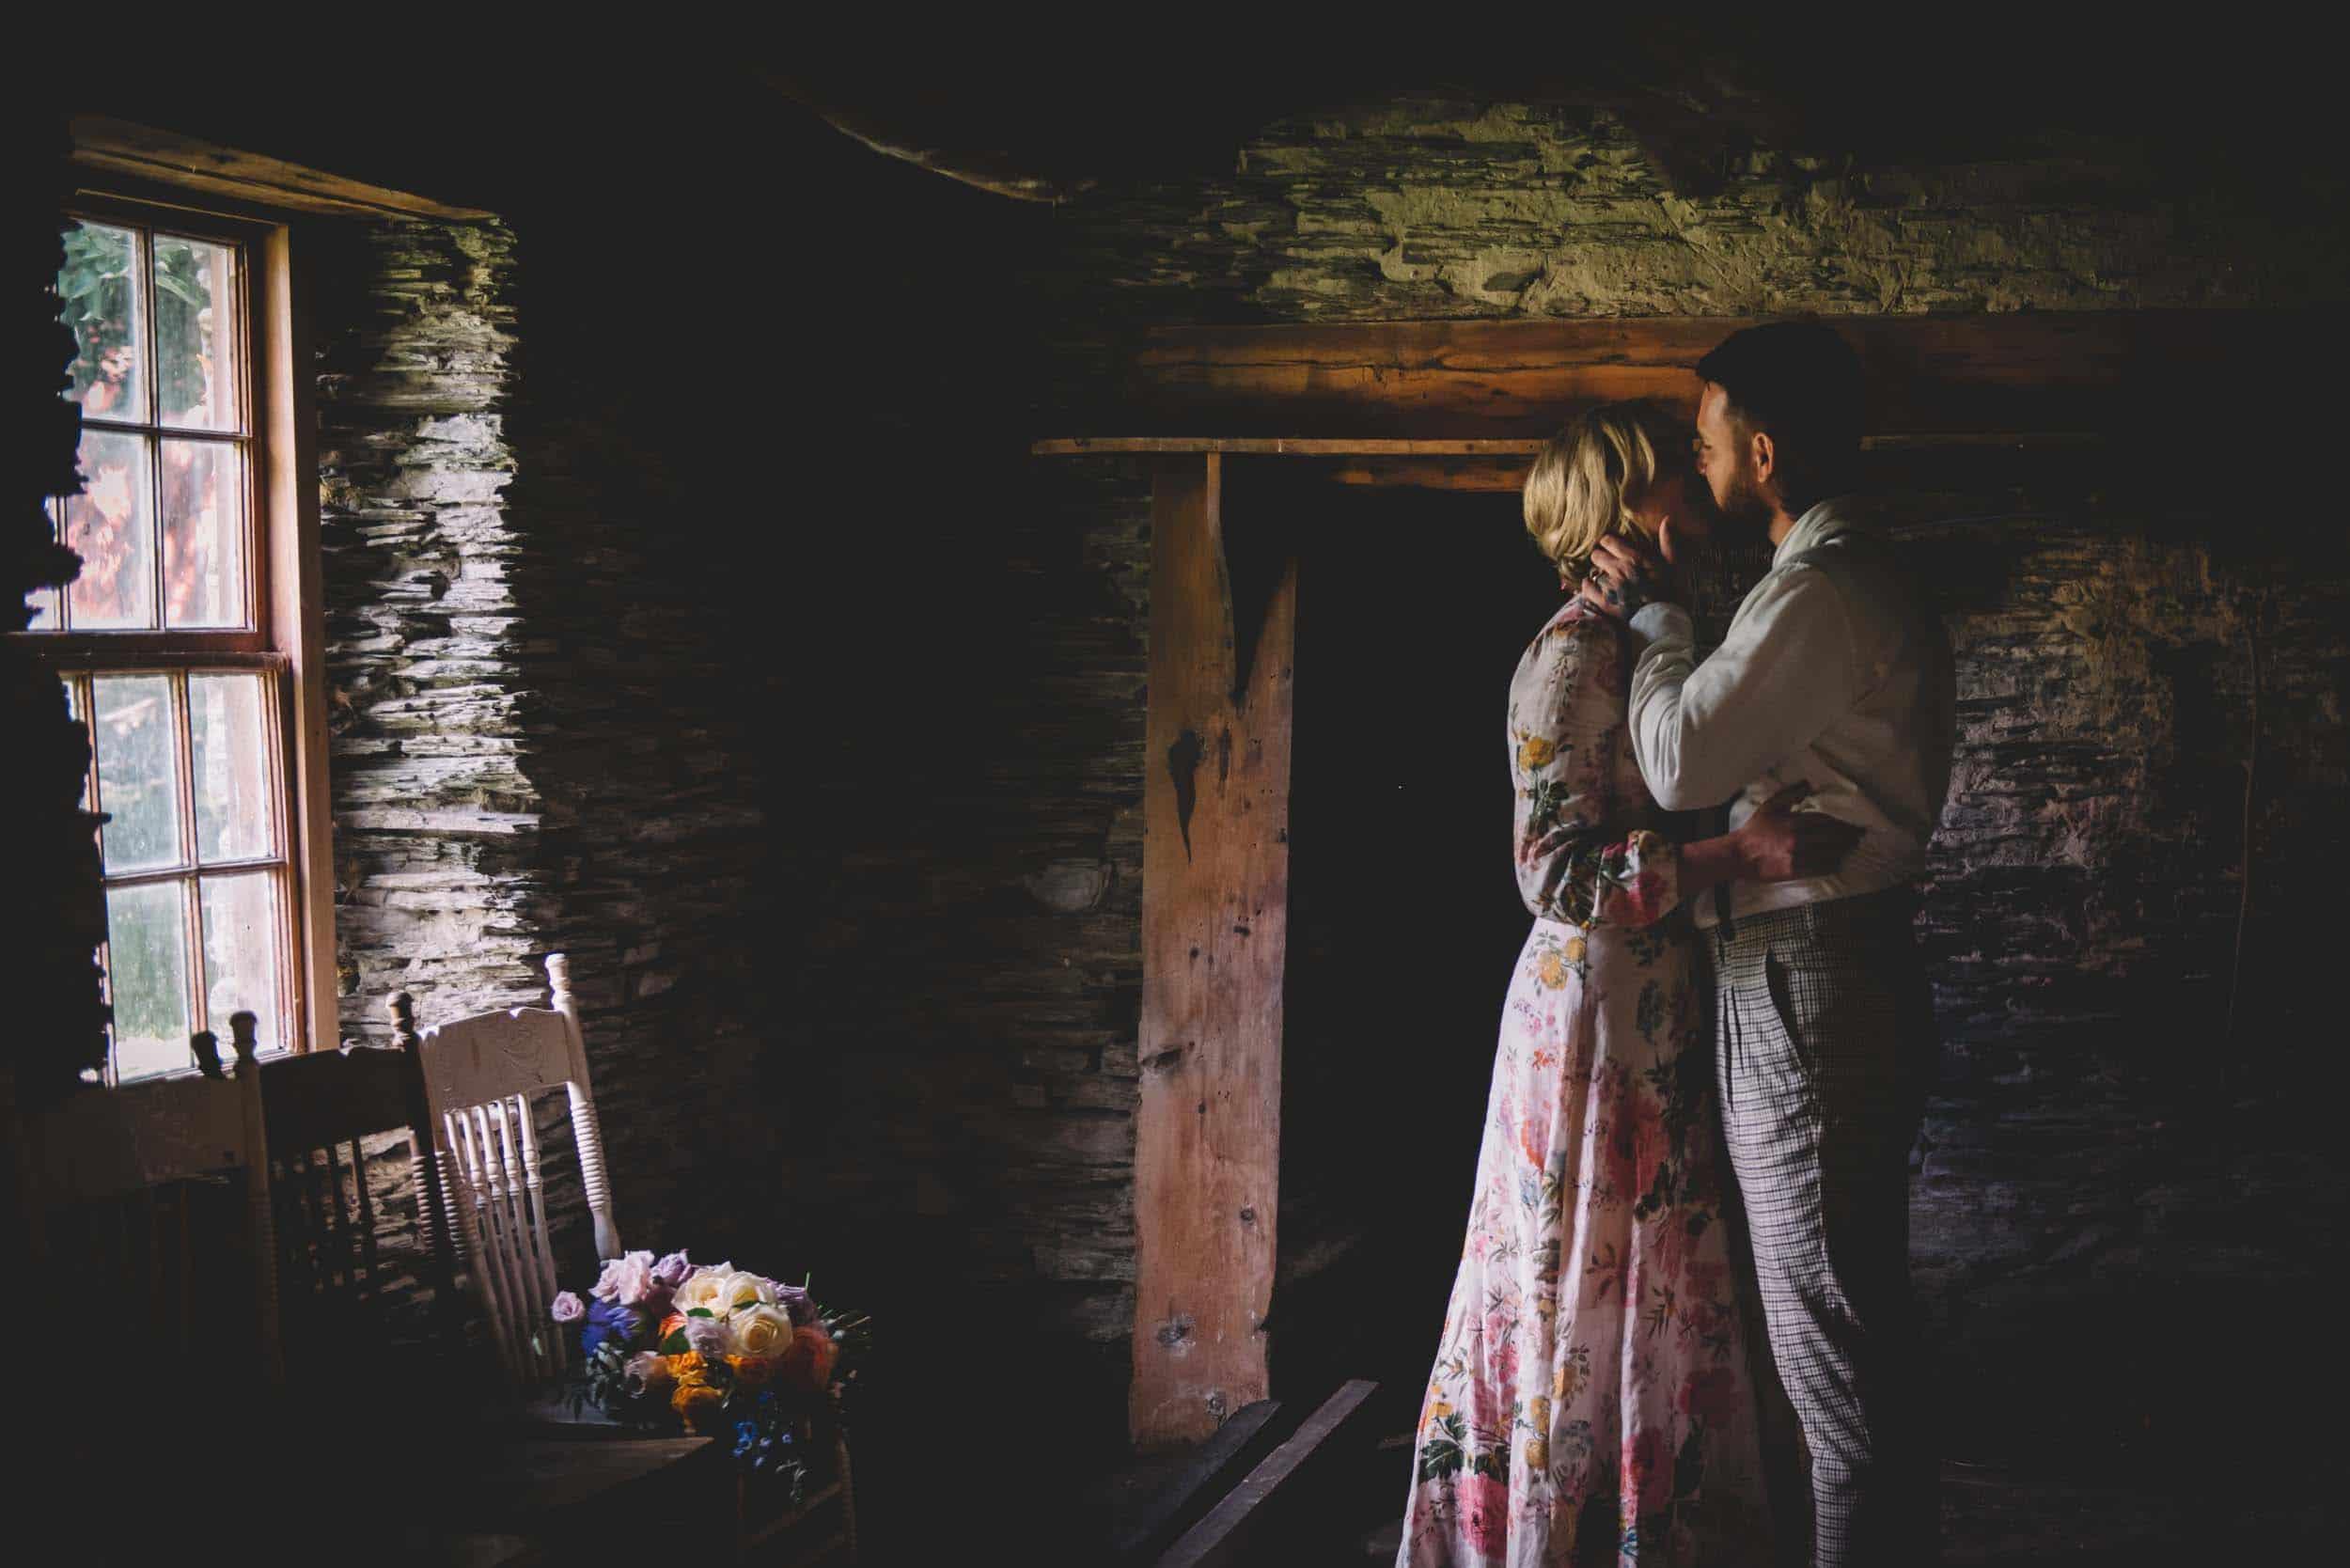 Nick & Nina's Thurlby Domain Elopement bride & groom photos tree